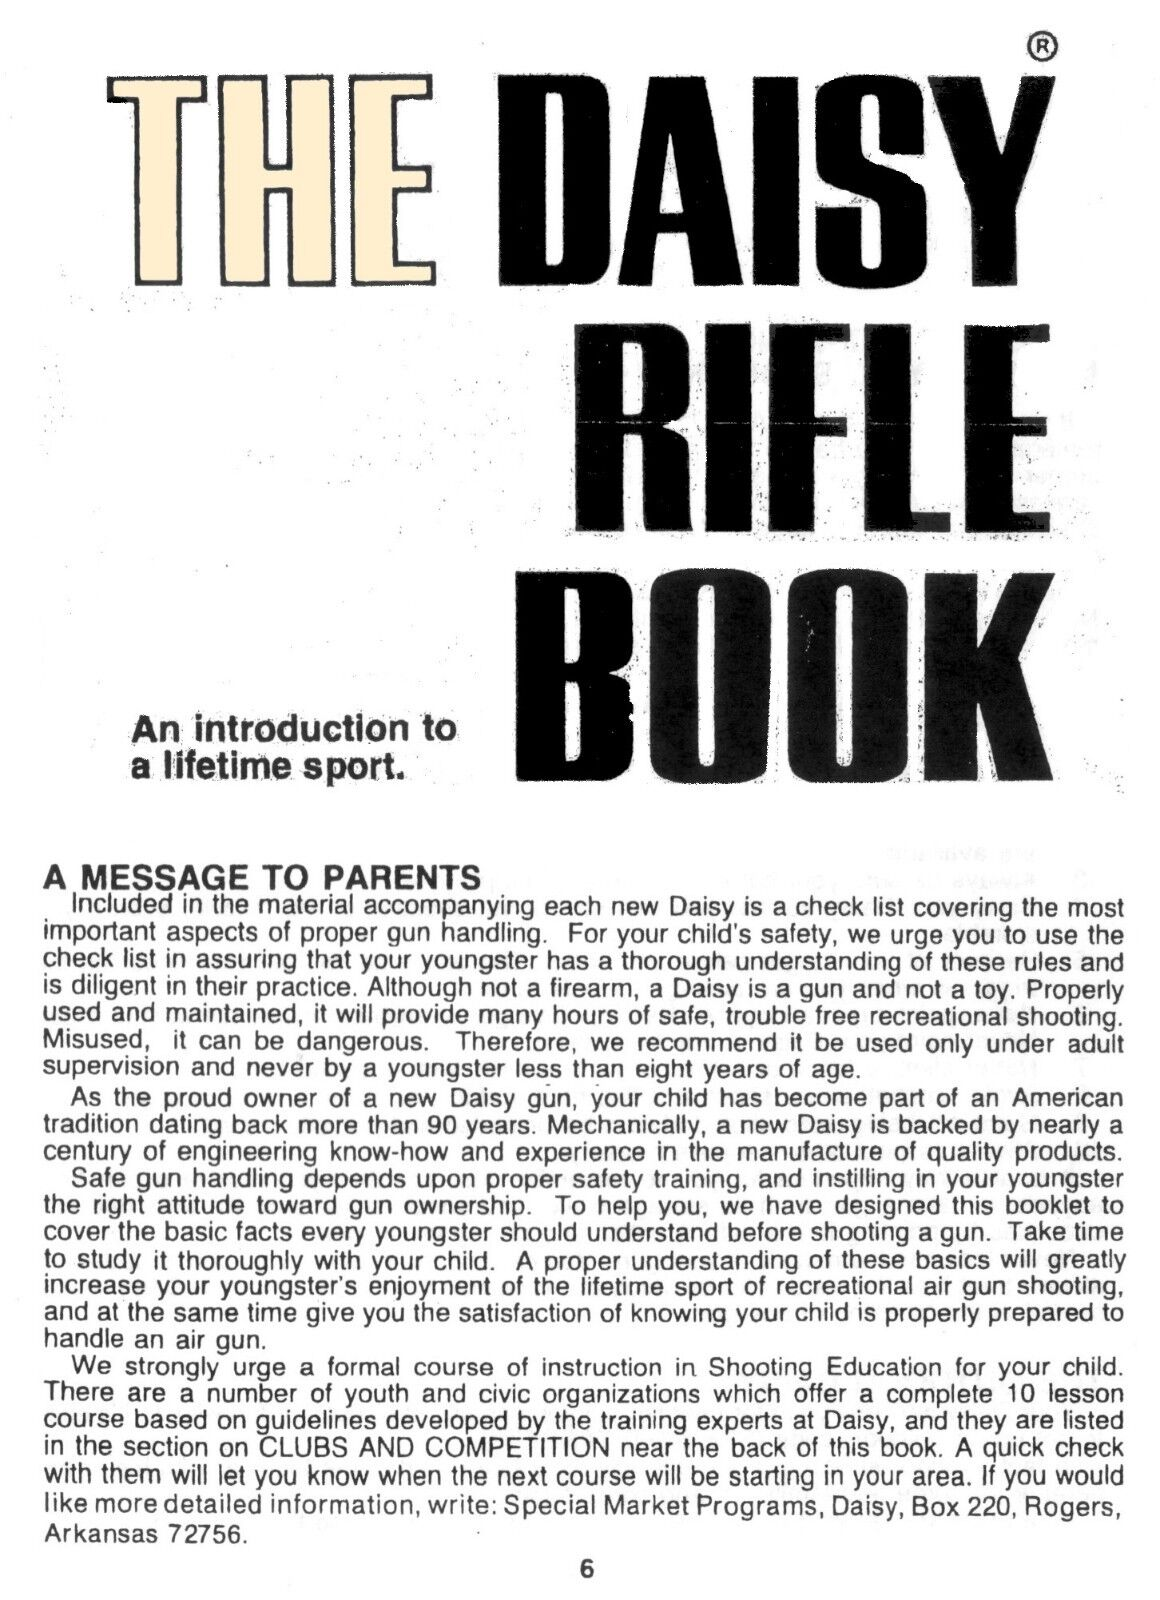 DAISY 1894 SPITTIN' Image™ PDF Re-drawn Service Manual